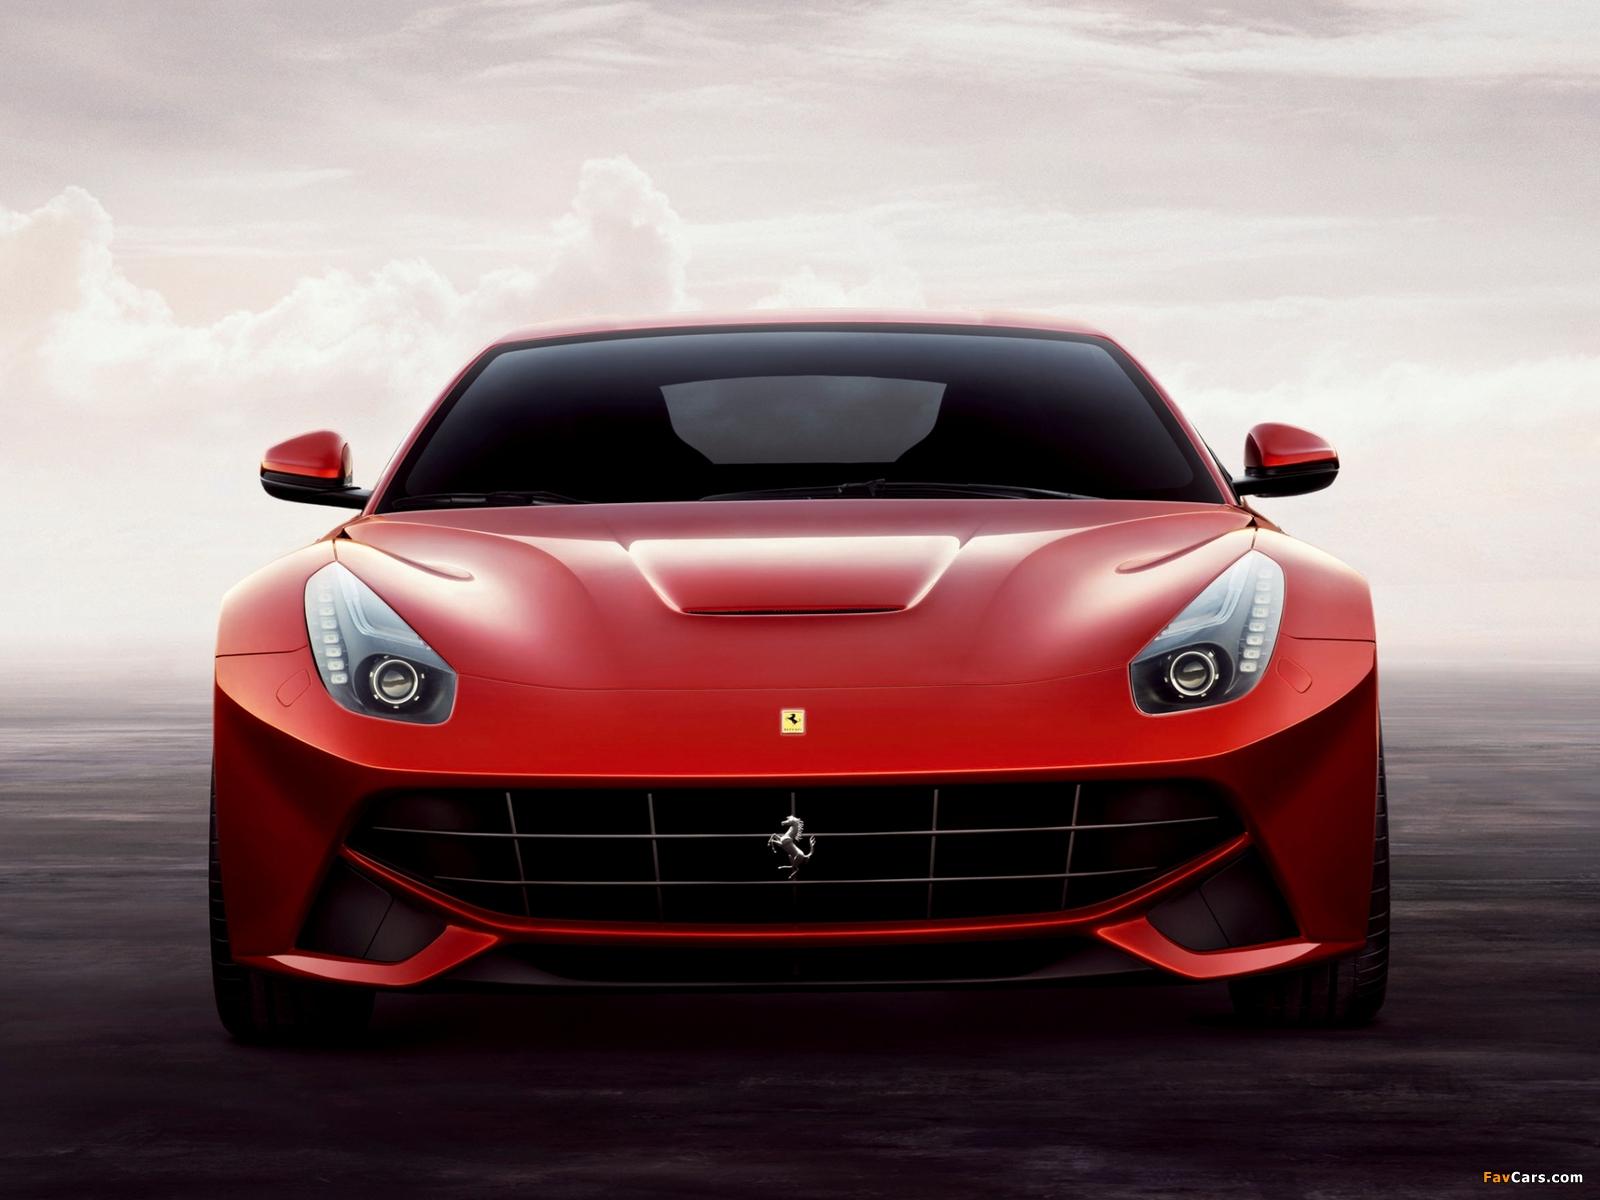 Ferrari F12berlinetta 2012 photos (1600 x 1200)